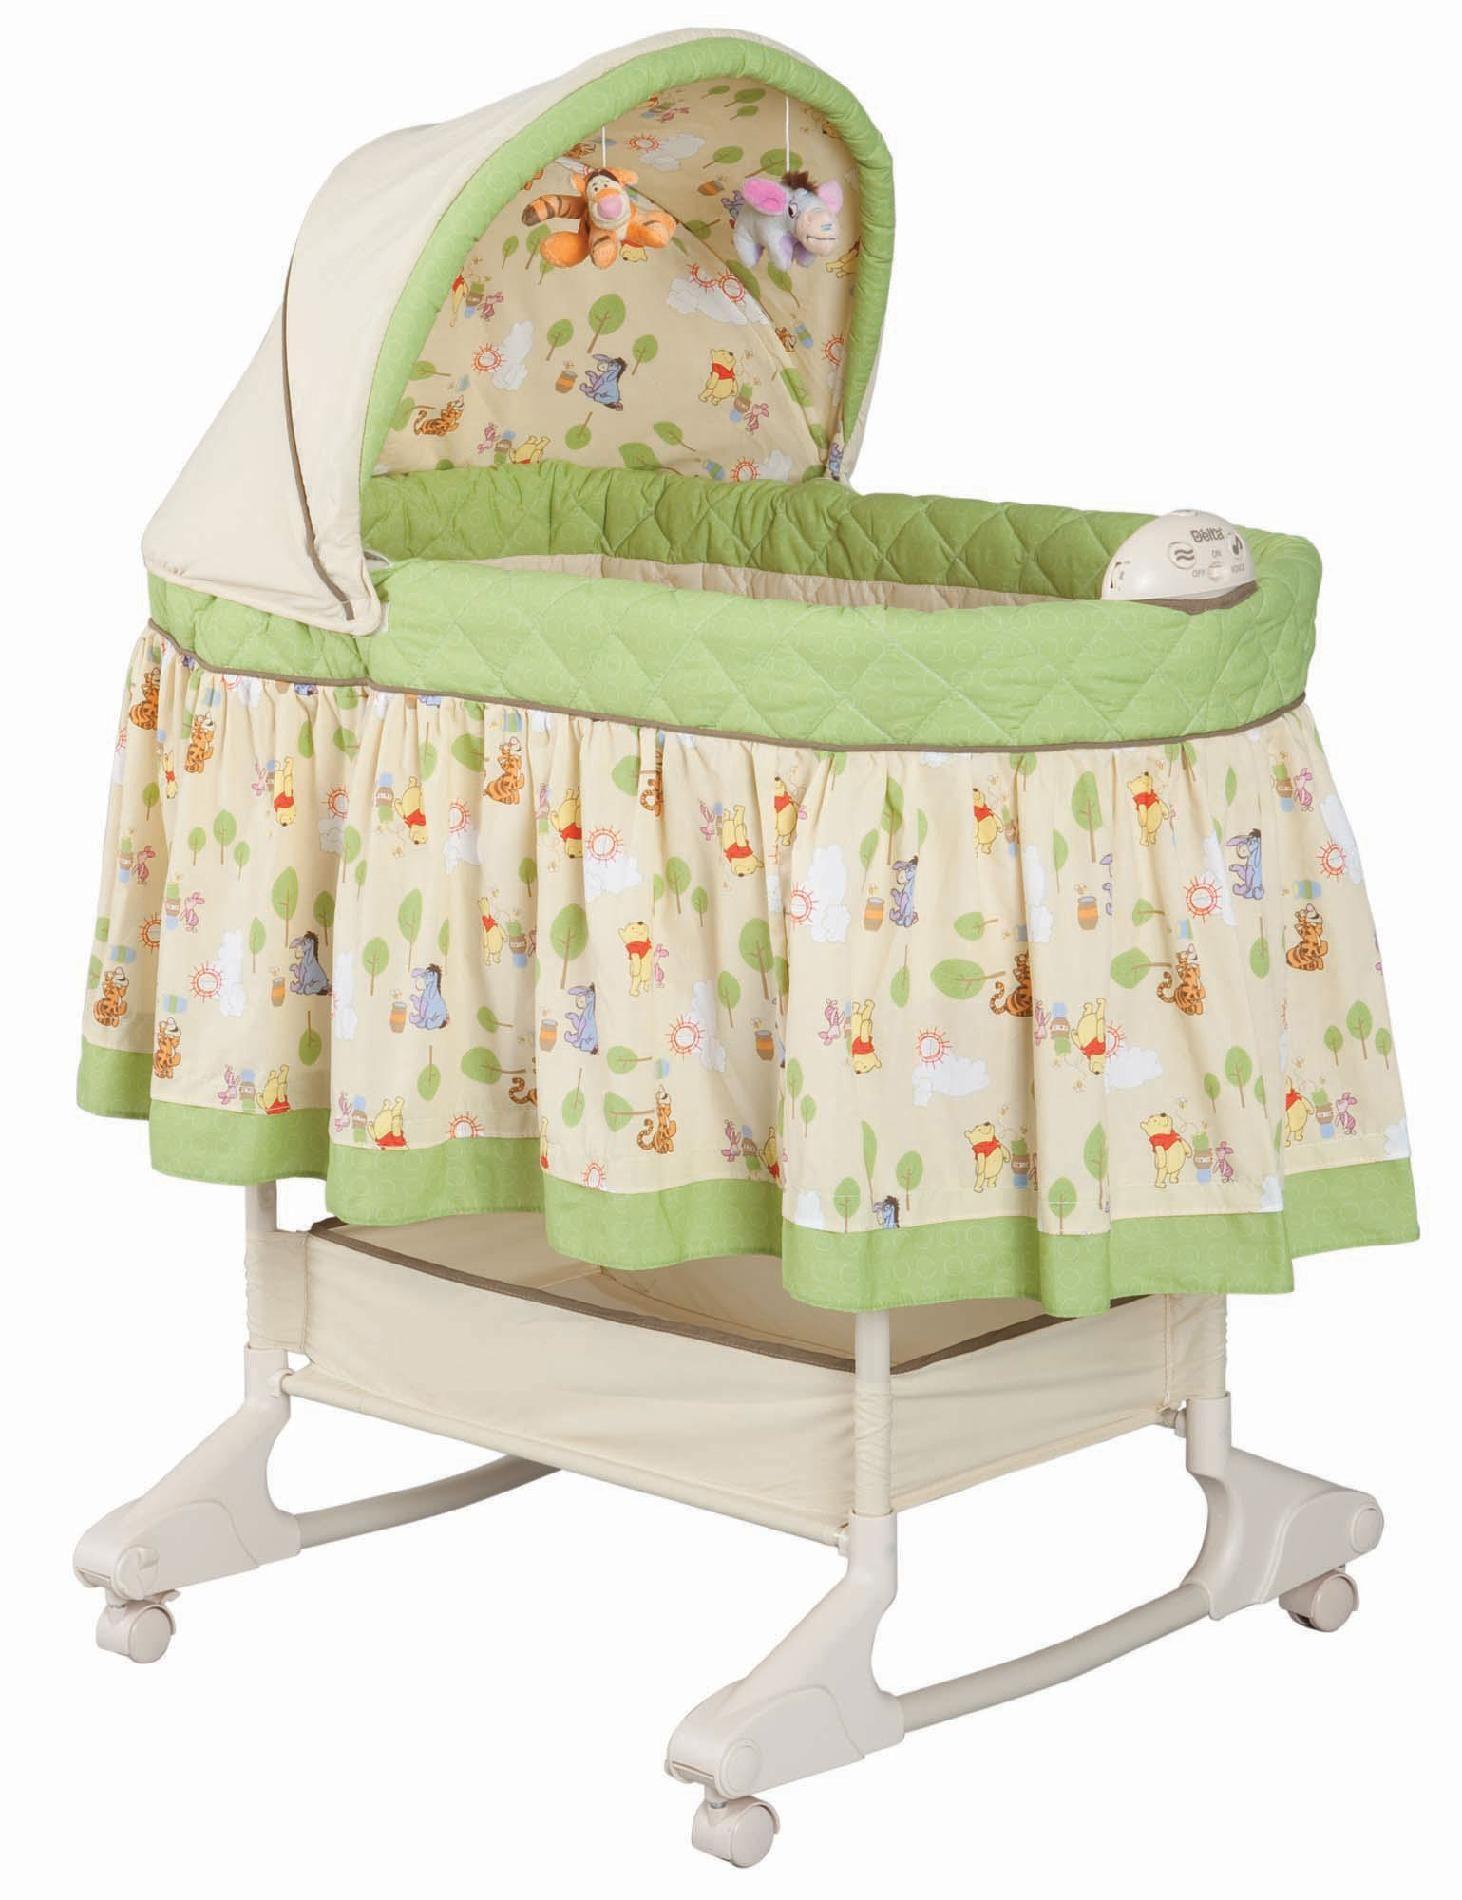 Disney Baby Rocking Bassinet - Happy Day Pooh - Baby - Furniture ...